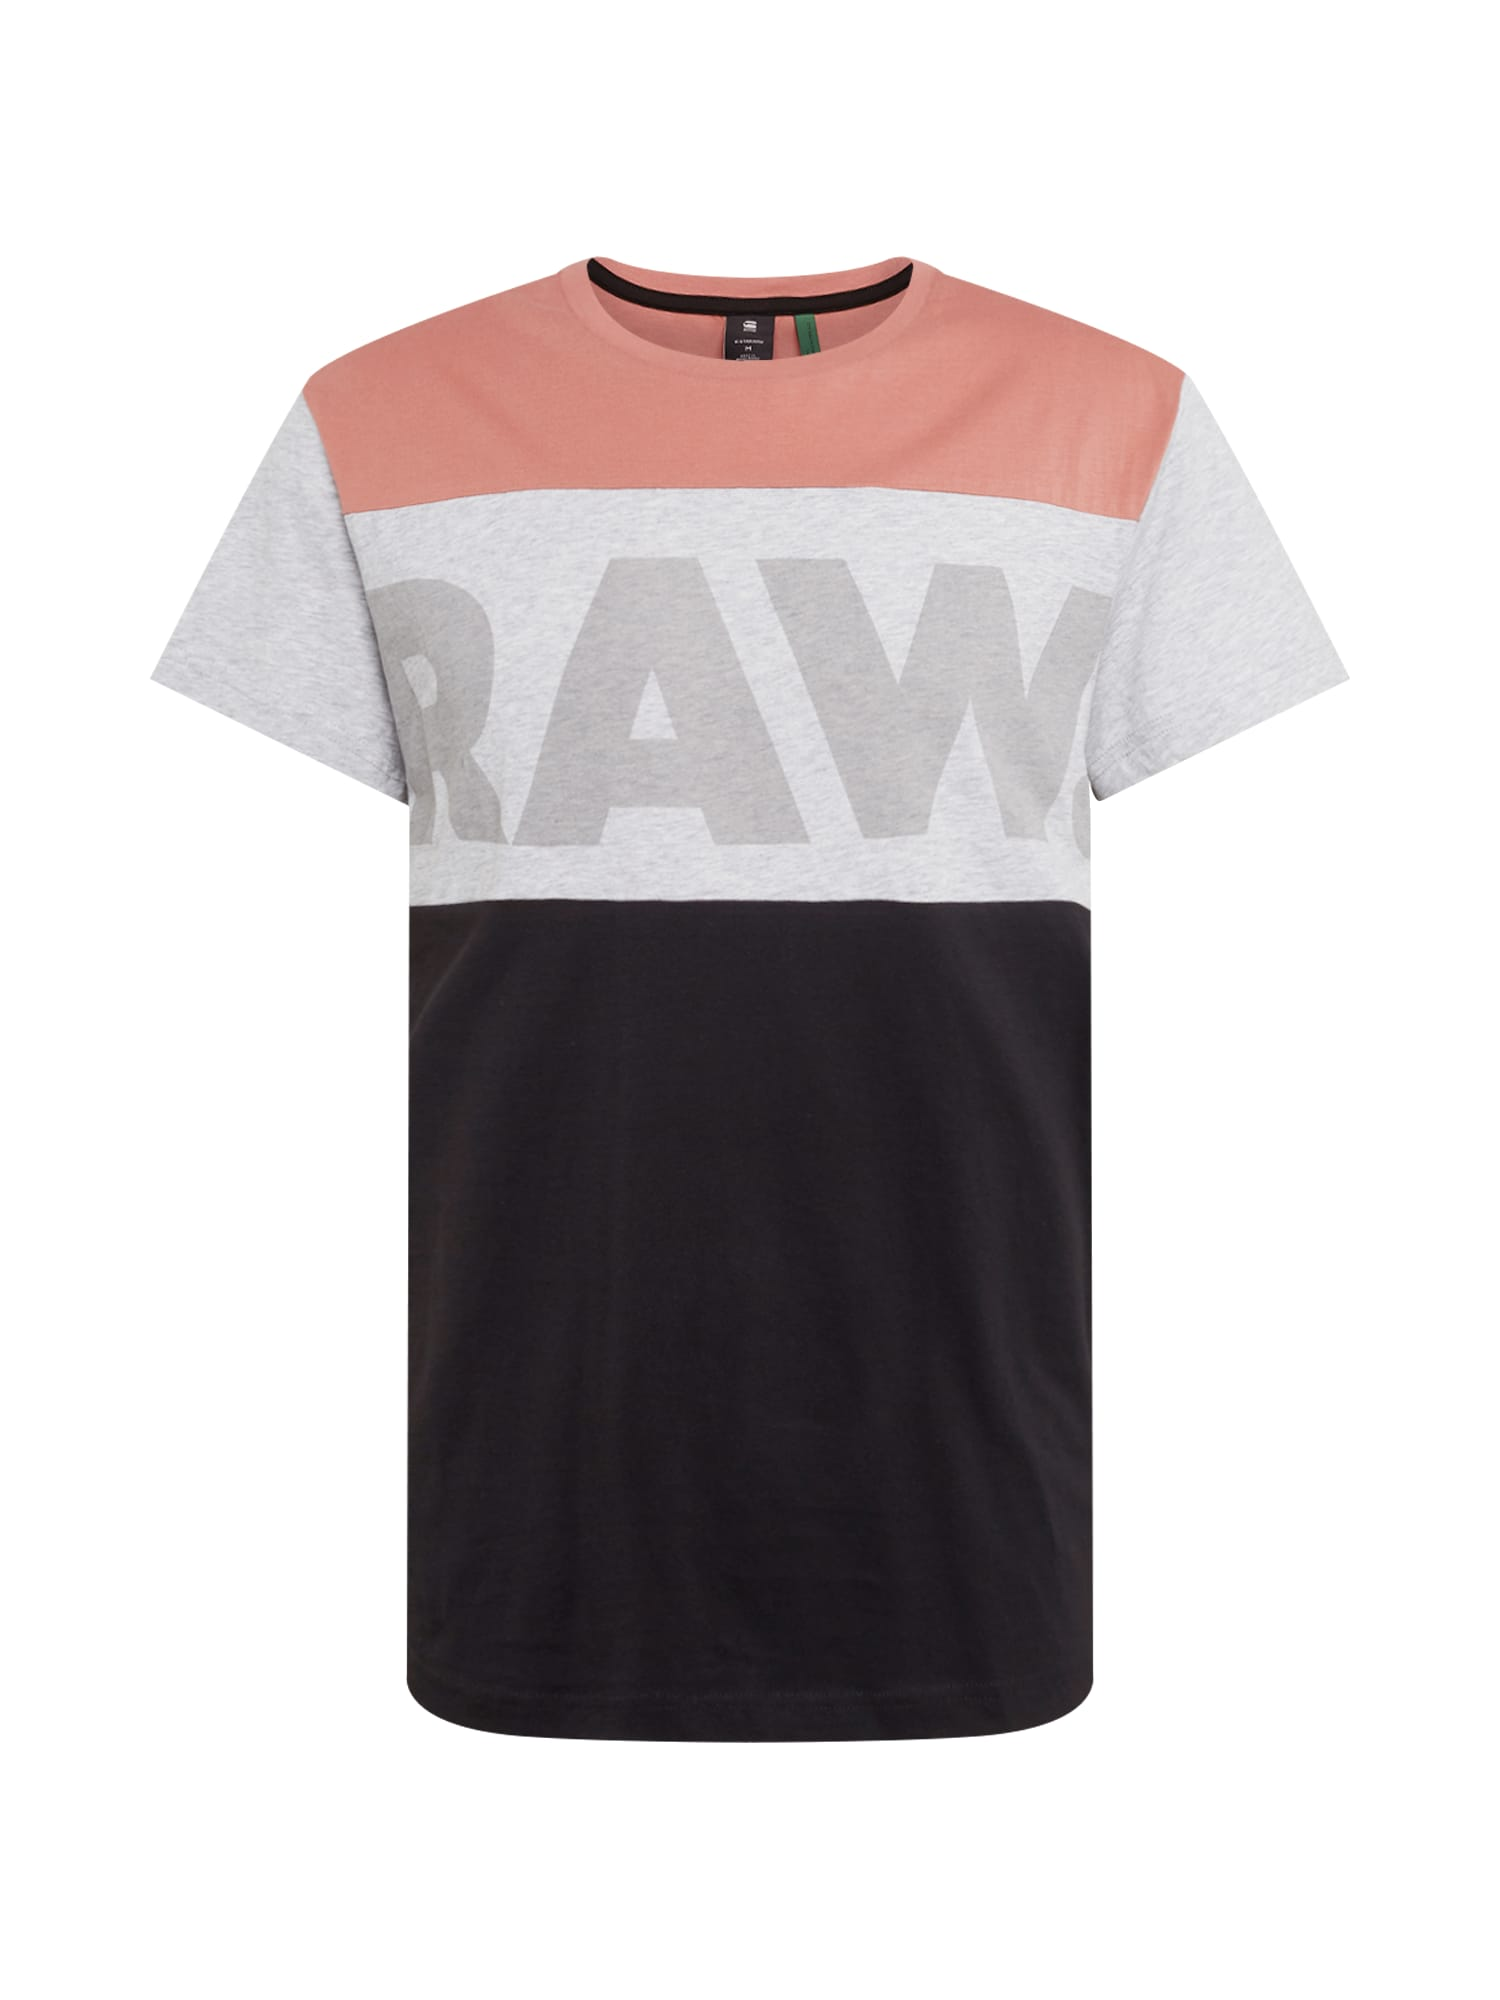 Tričko Starkon graphic loose r t ss růžová černá G-STAR RAW